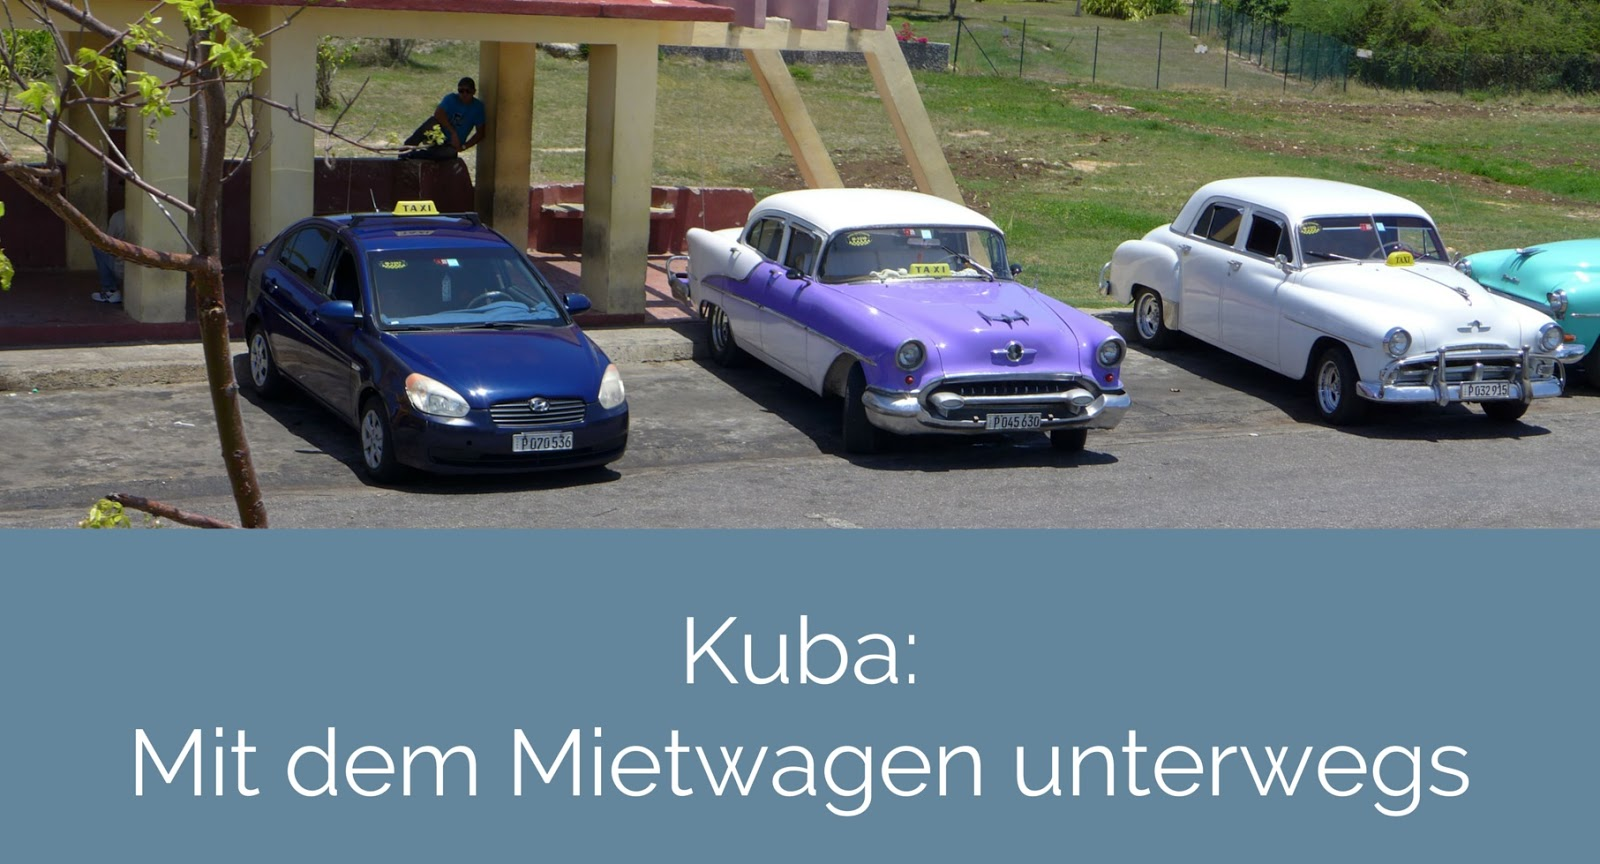 namida magazin kuba teil 2 mit dem mietwagen unterwegs oder no problems no cuba. Black Bedroom Furniture Sets. Home Design Ideas